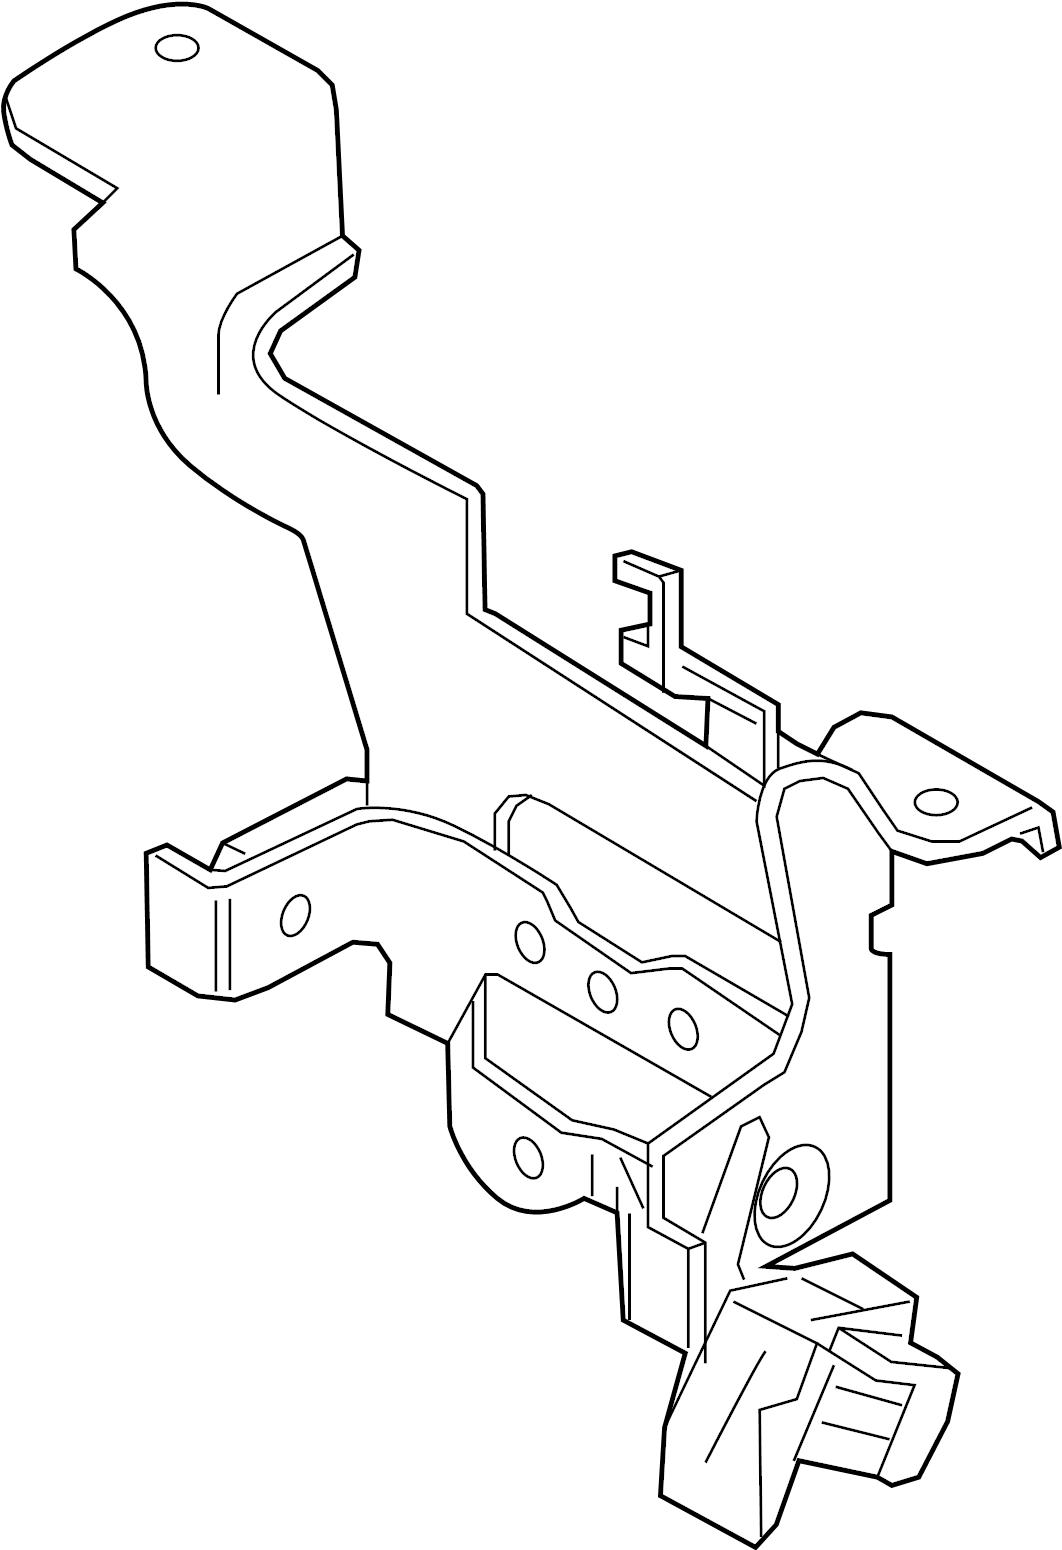 Cruise Ship Engine Control Room: Nissan Murano Cruise Control Distance Sensor Bracket. BODY